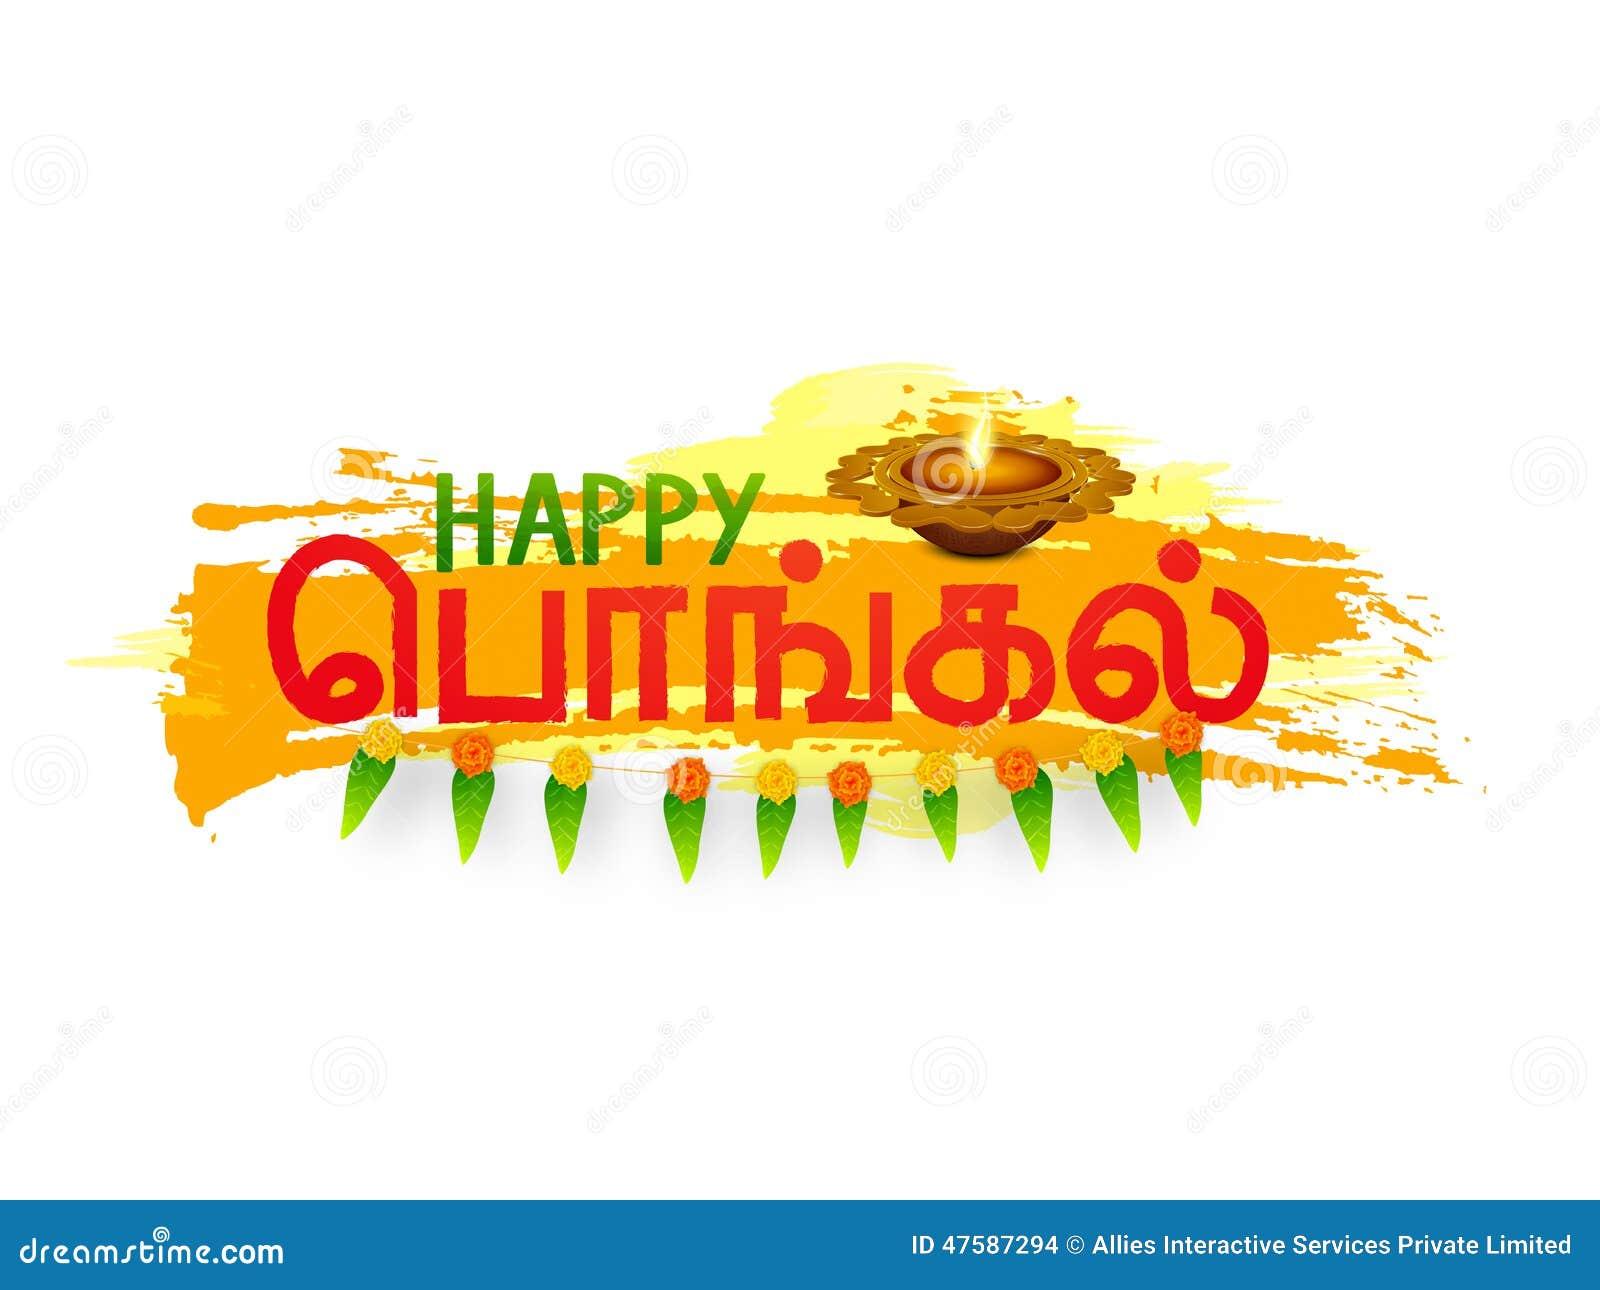 Poster Or Banner Design For Happy Pongal Festival Celebrations